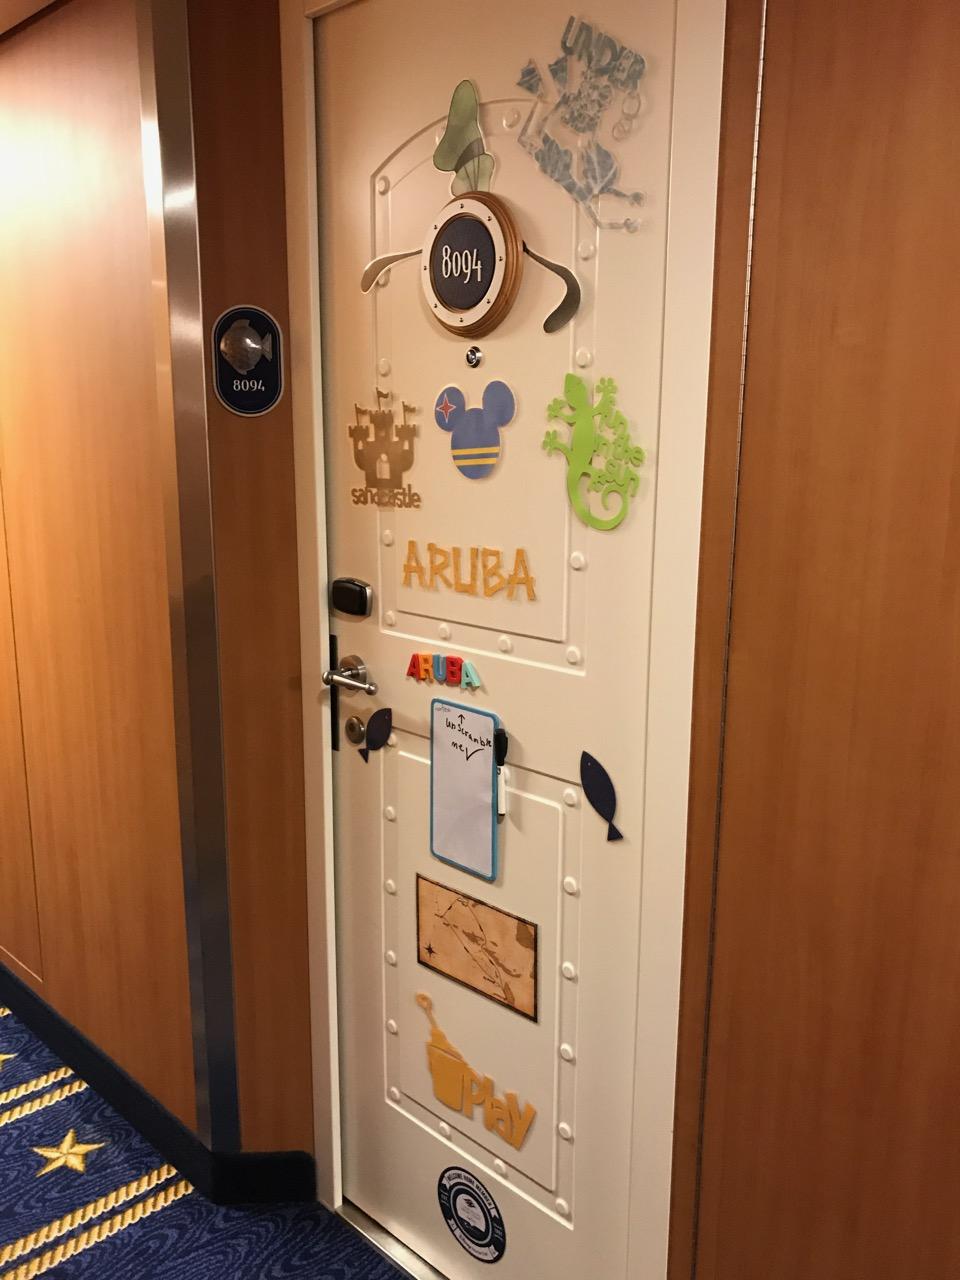 Disney Fantasy - Stateroom Door Decorated for Aruba